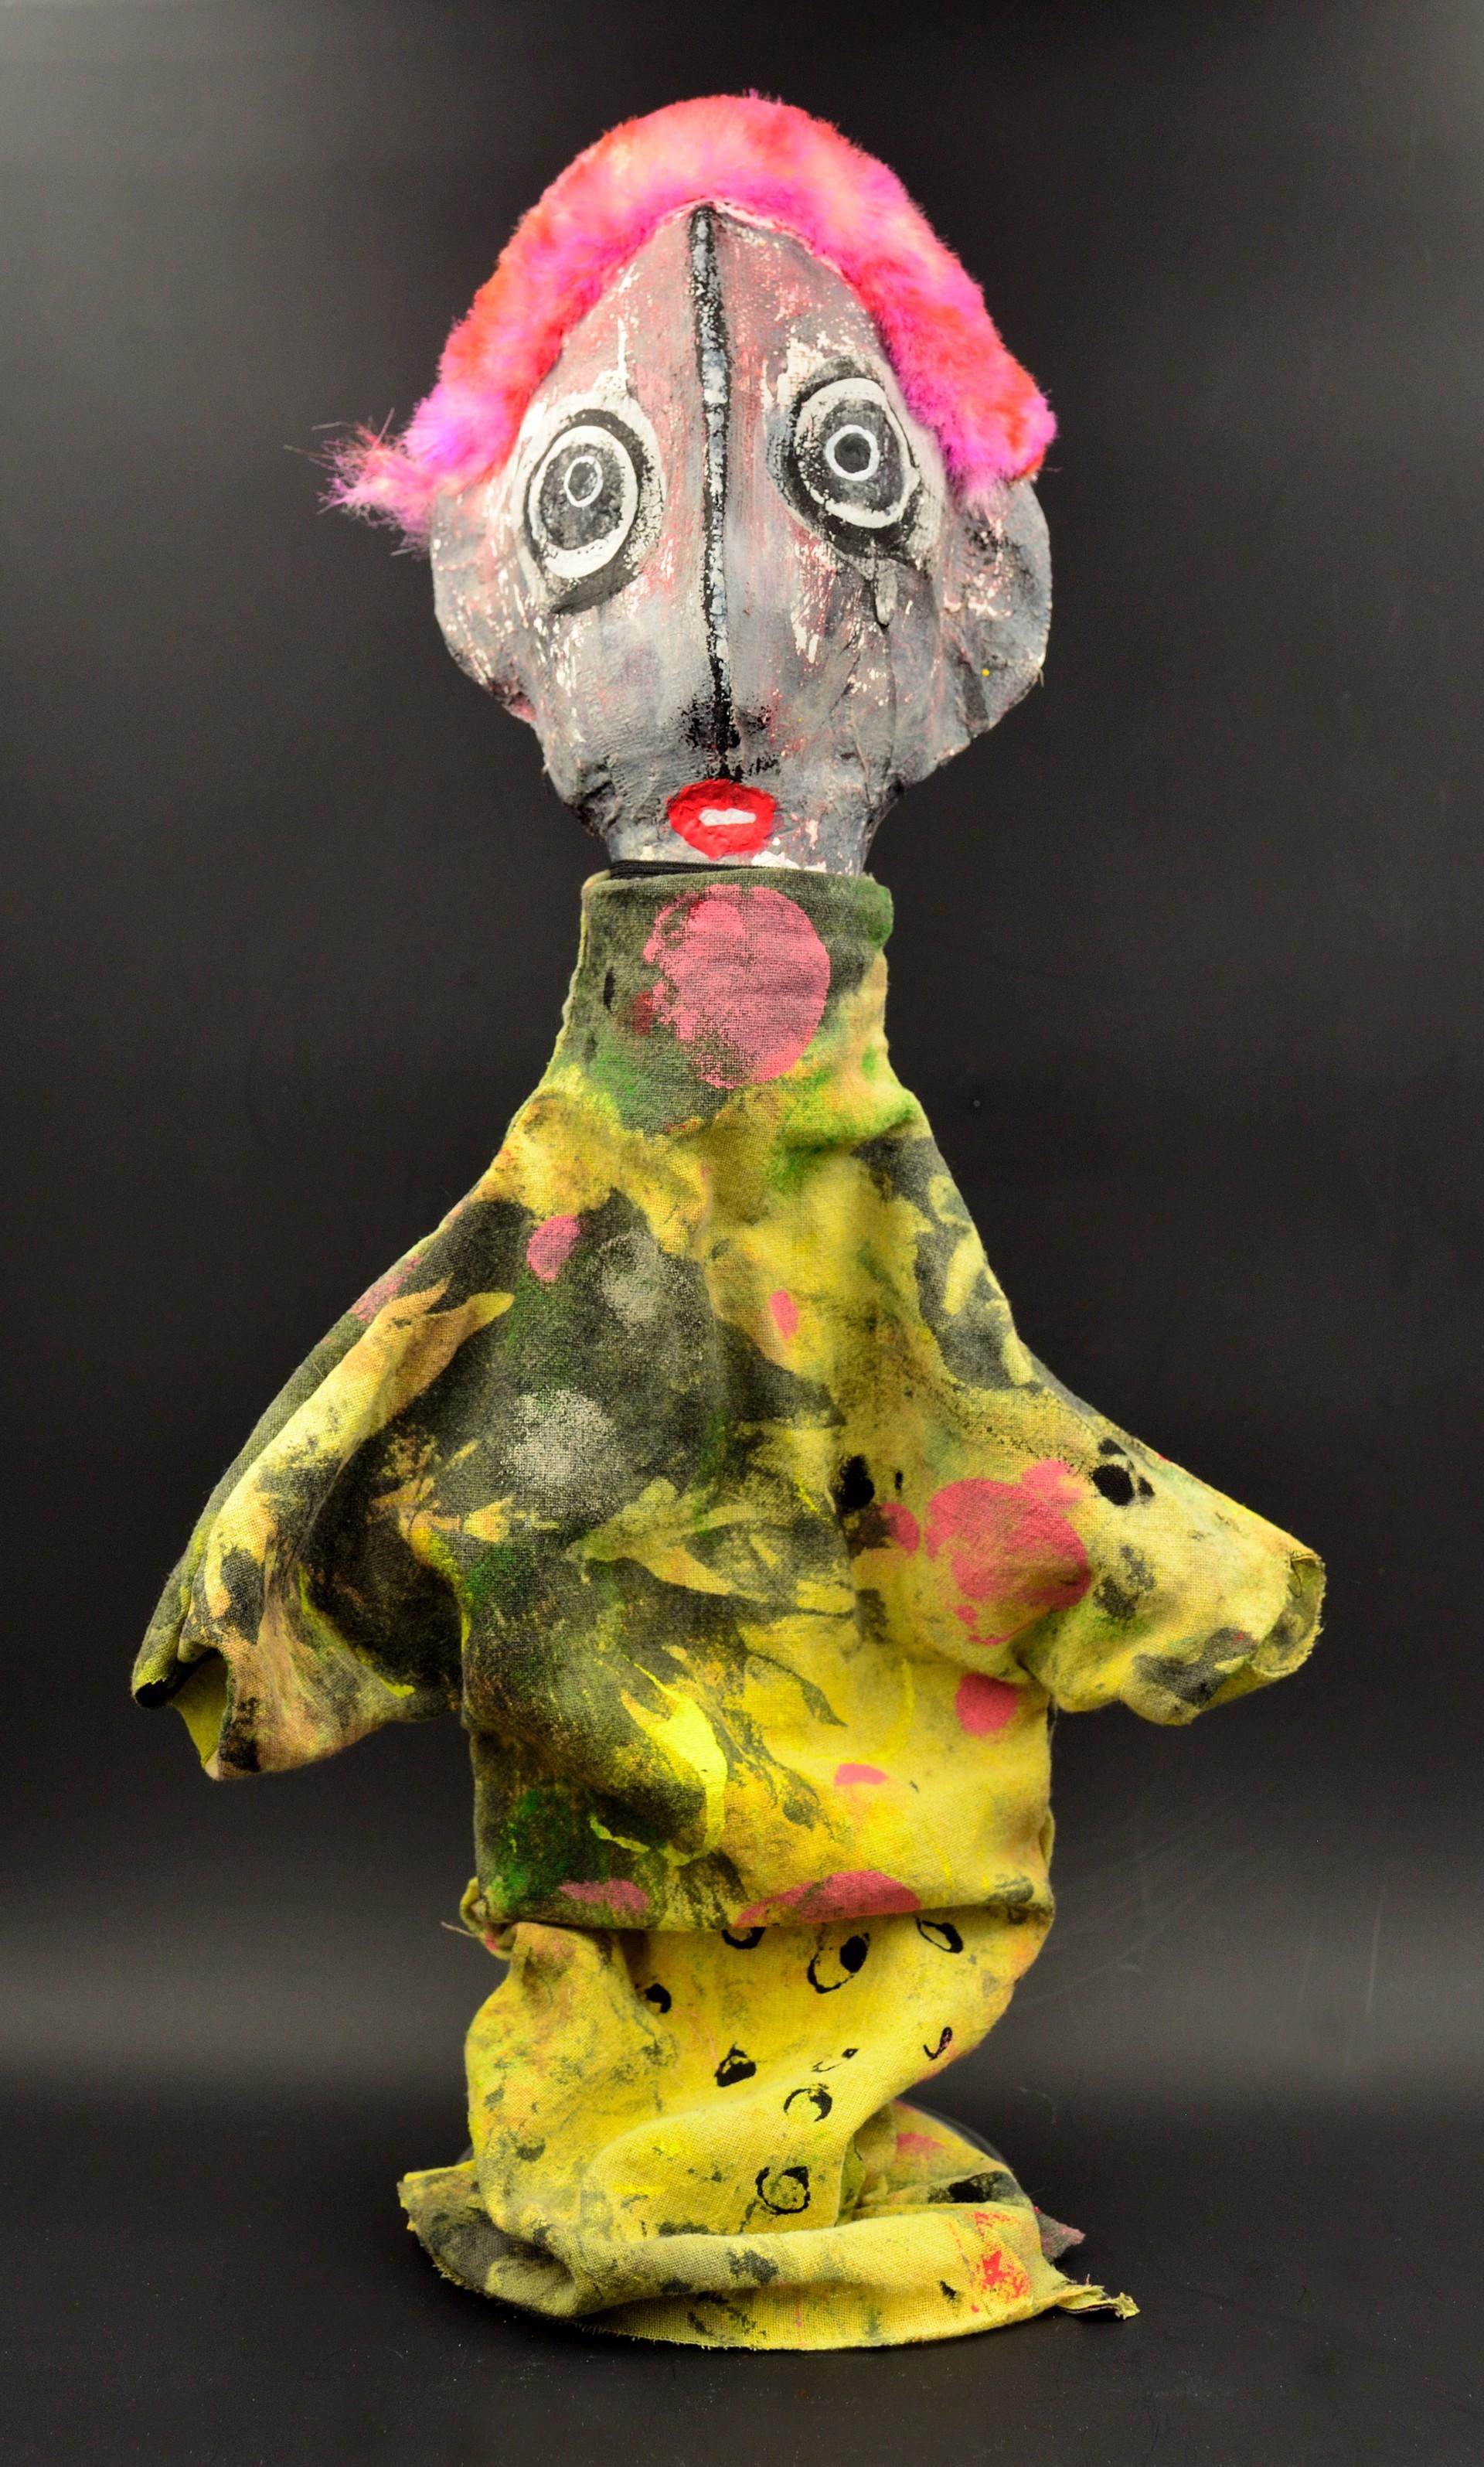 Clown Apocalypse (pink #2) by Laura Castellanos